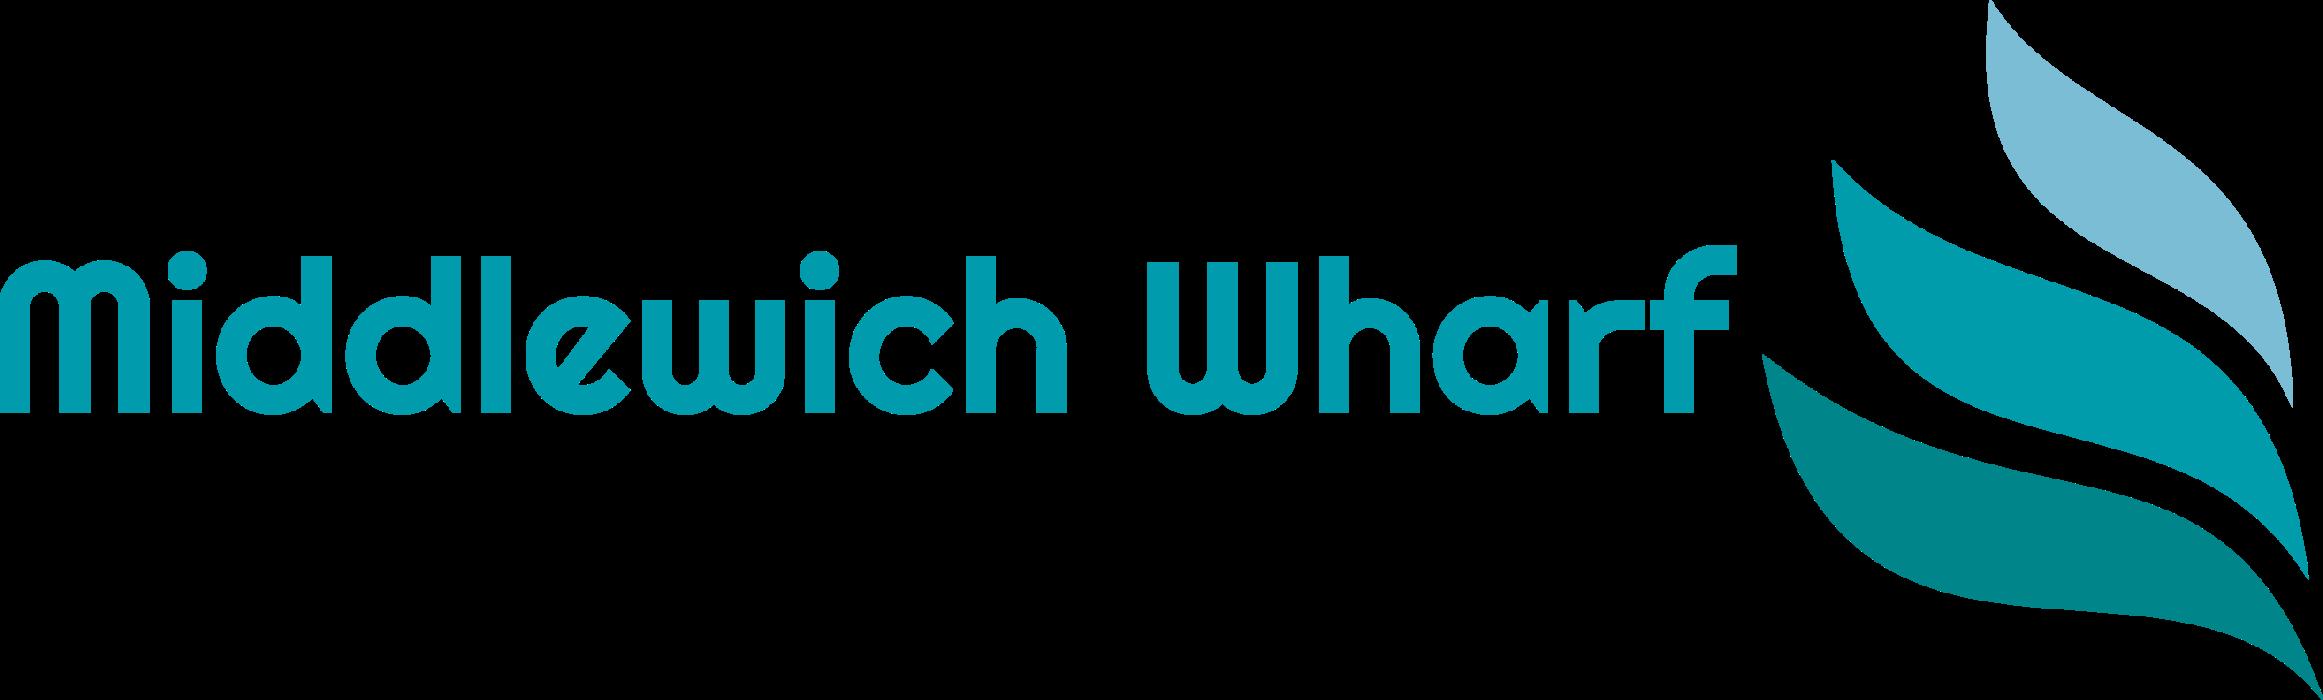 Middlewich Wharf 1